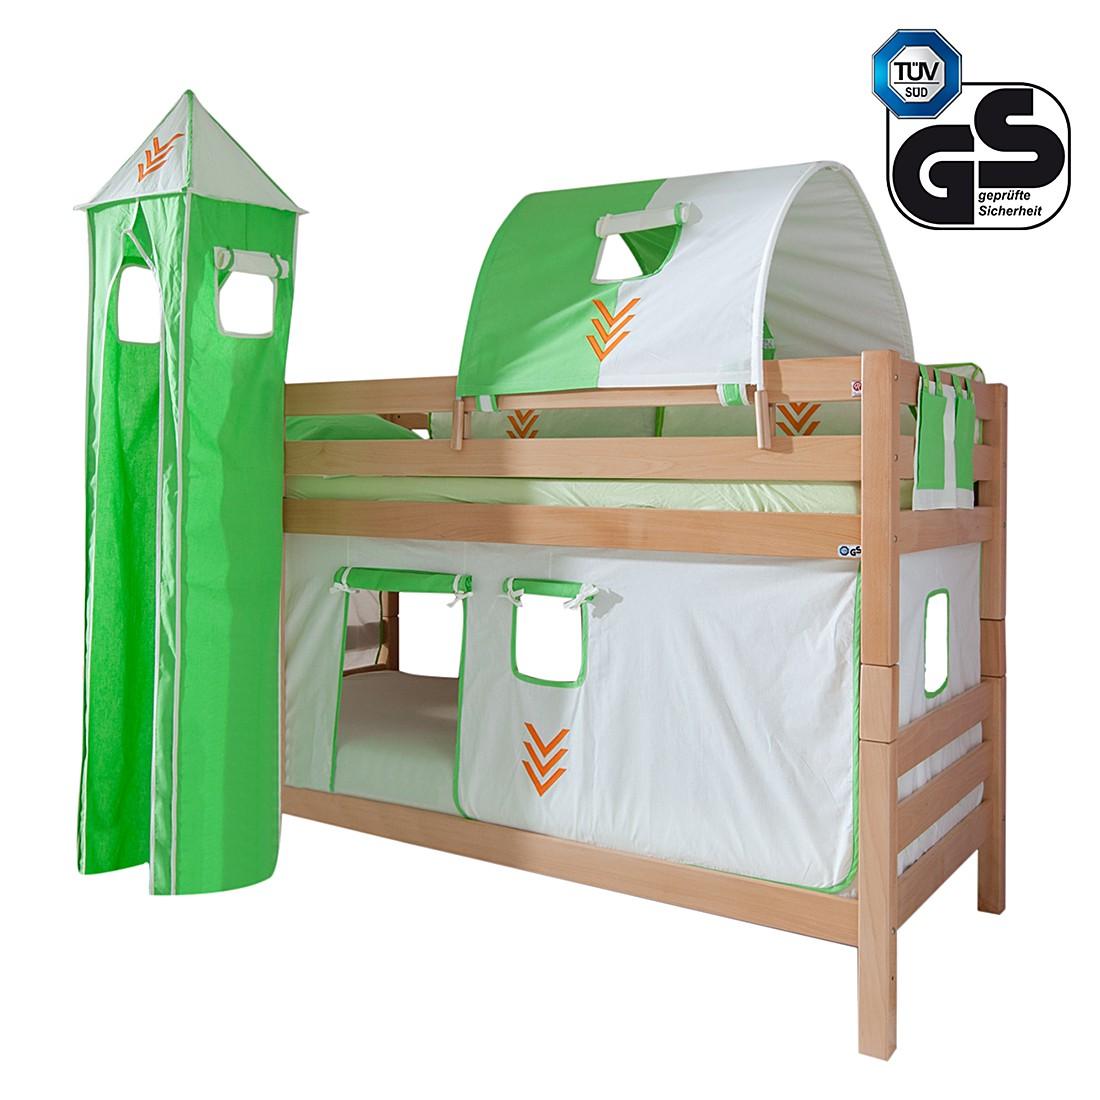 home24 Etagenbett Beni | Kinderzimmer > Kinderbetten > Etagenbetten | Braun | Massivholz - Holz | Relita